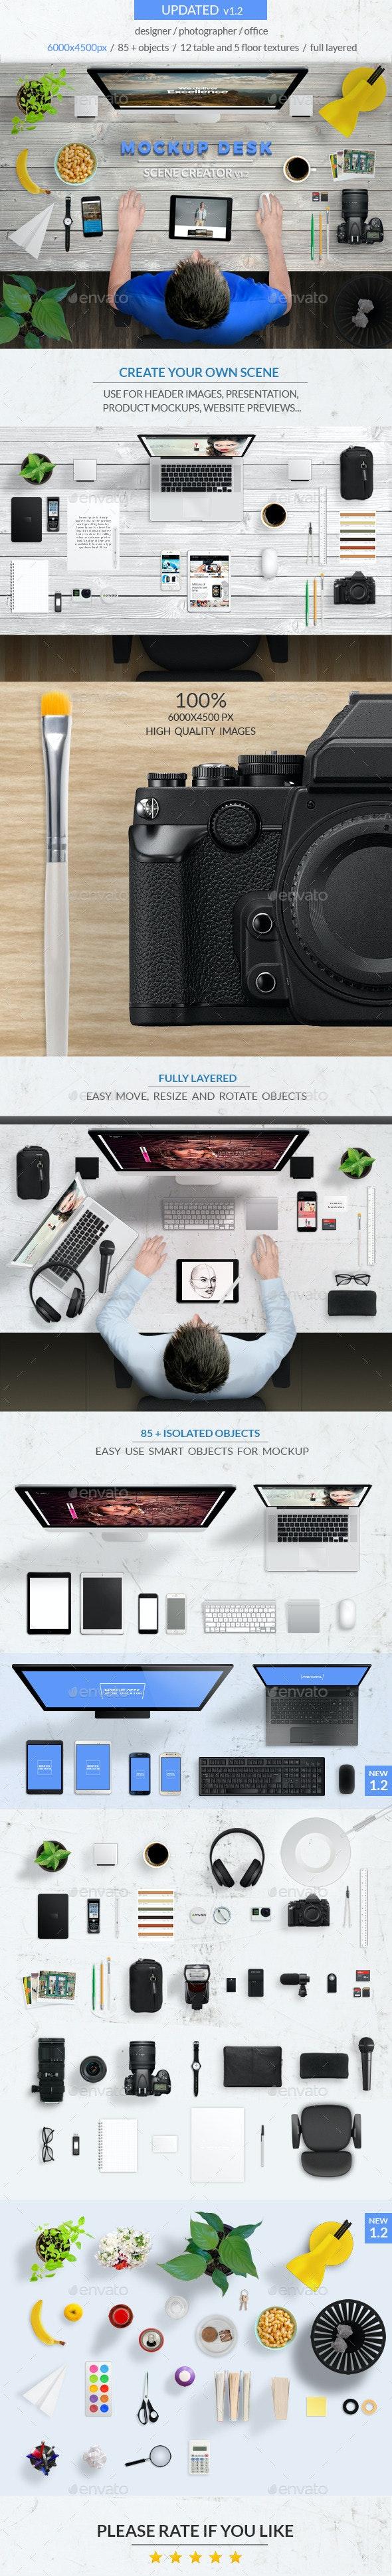 Mockup Desk Scene Creator - Hero Images Graphics